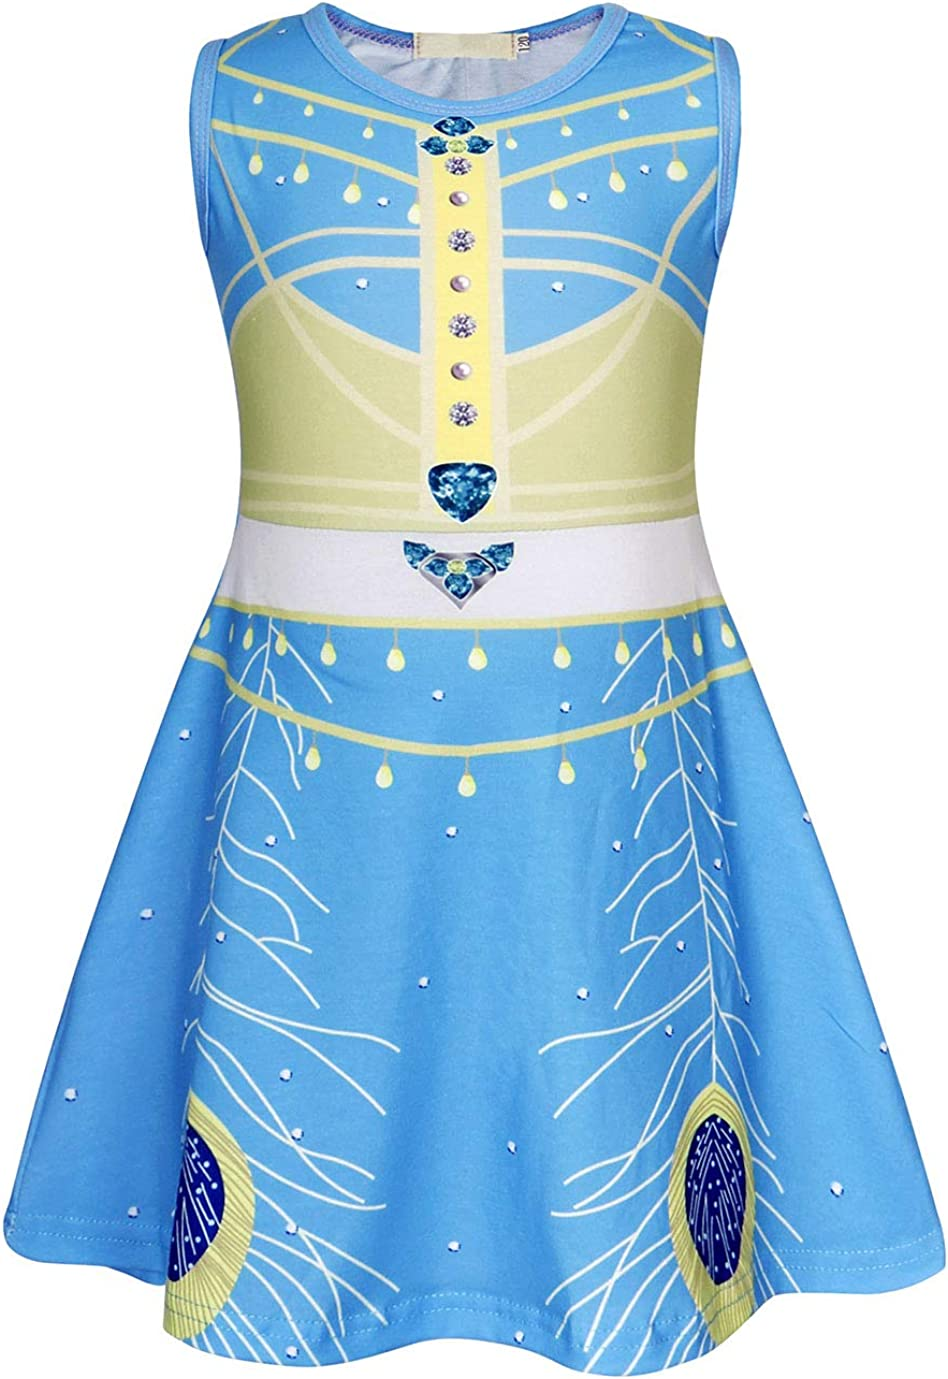 Cotrio Princess Jessie Costume Dress Toddler Girls Birthday Halloween Cosplay Dress Up